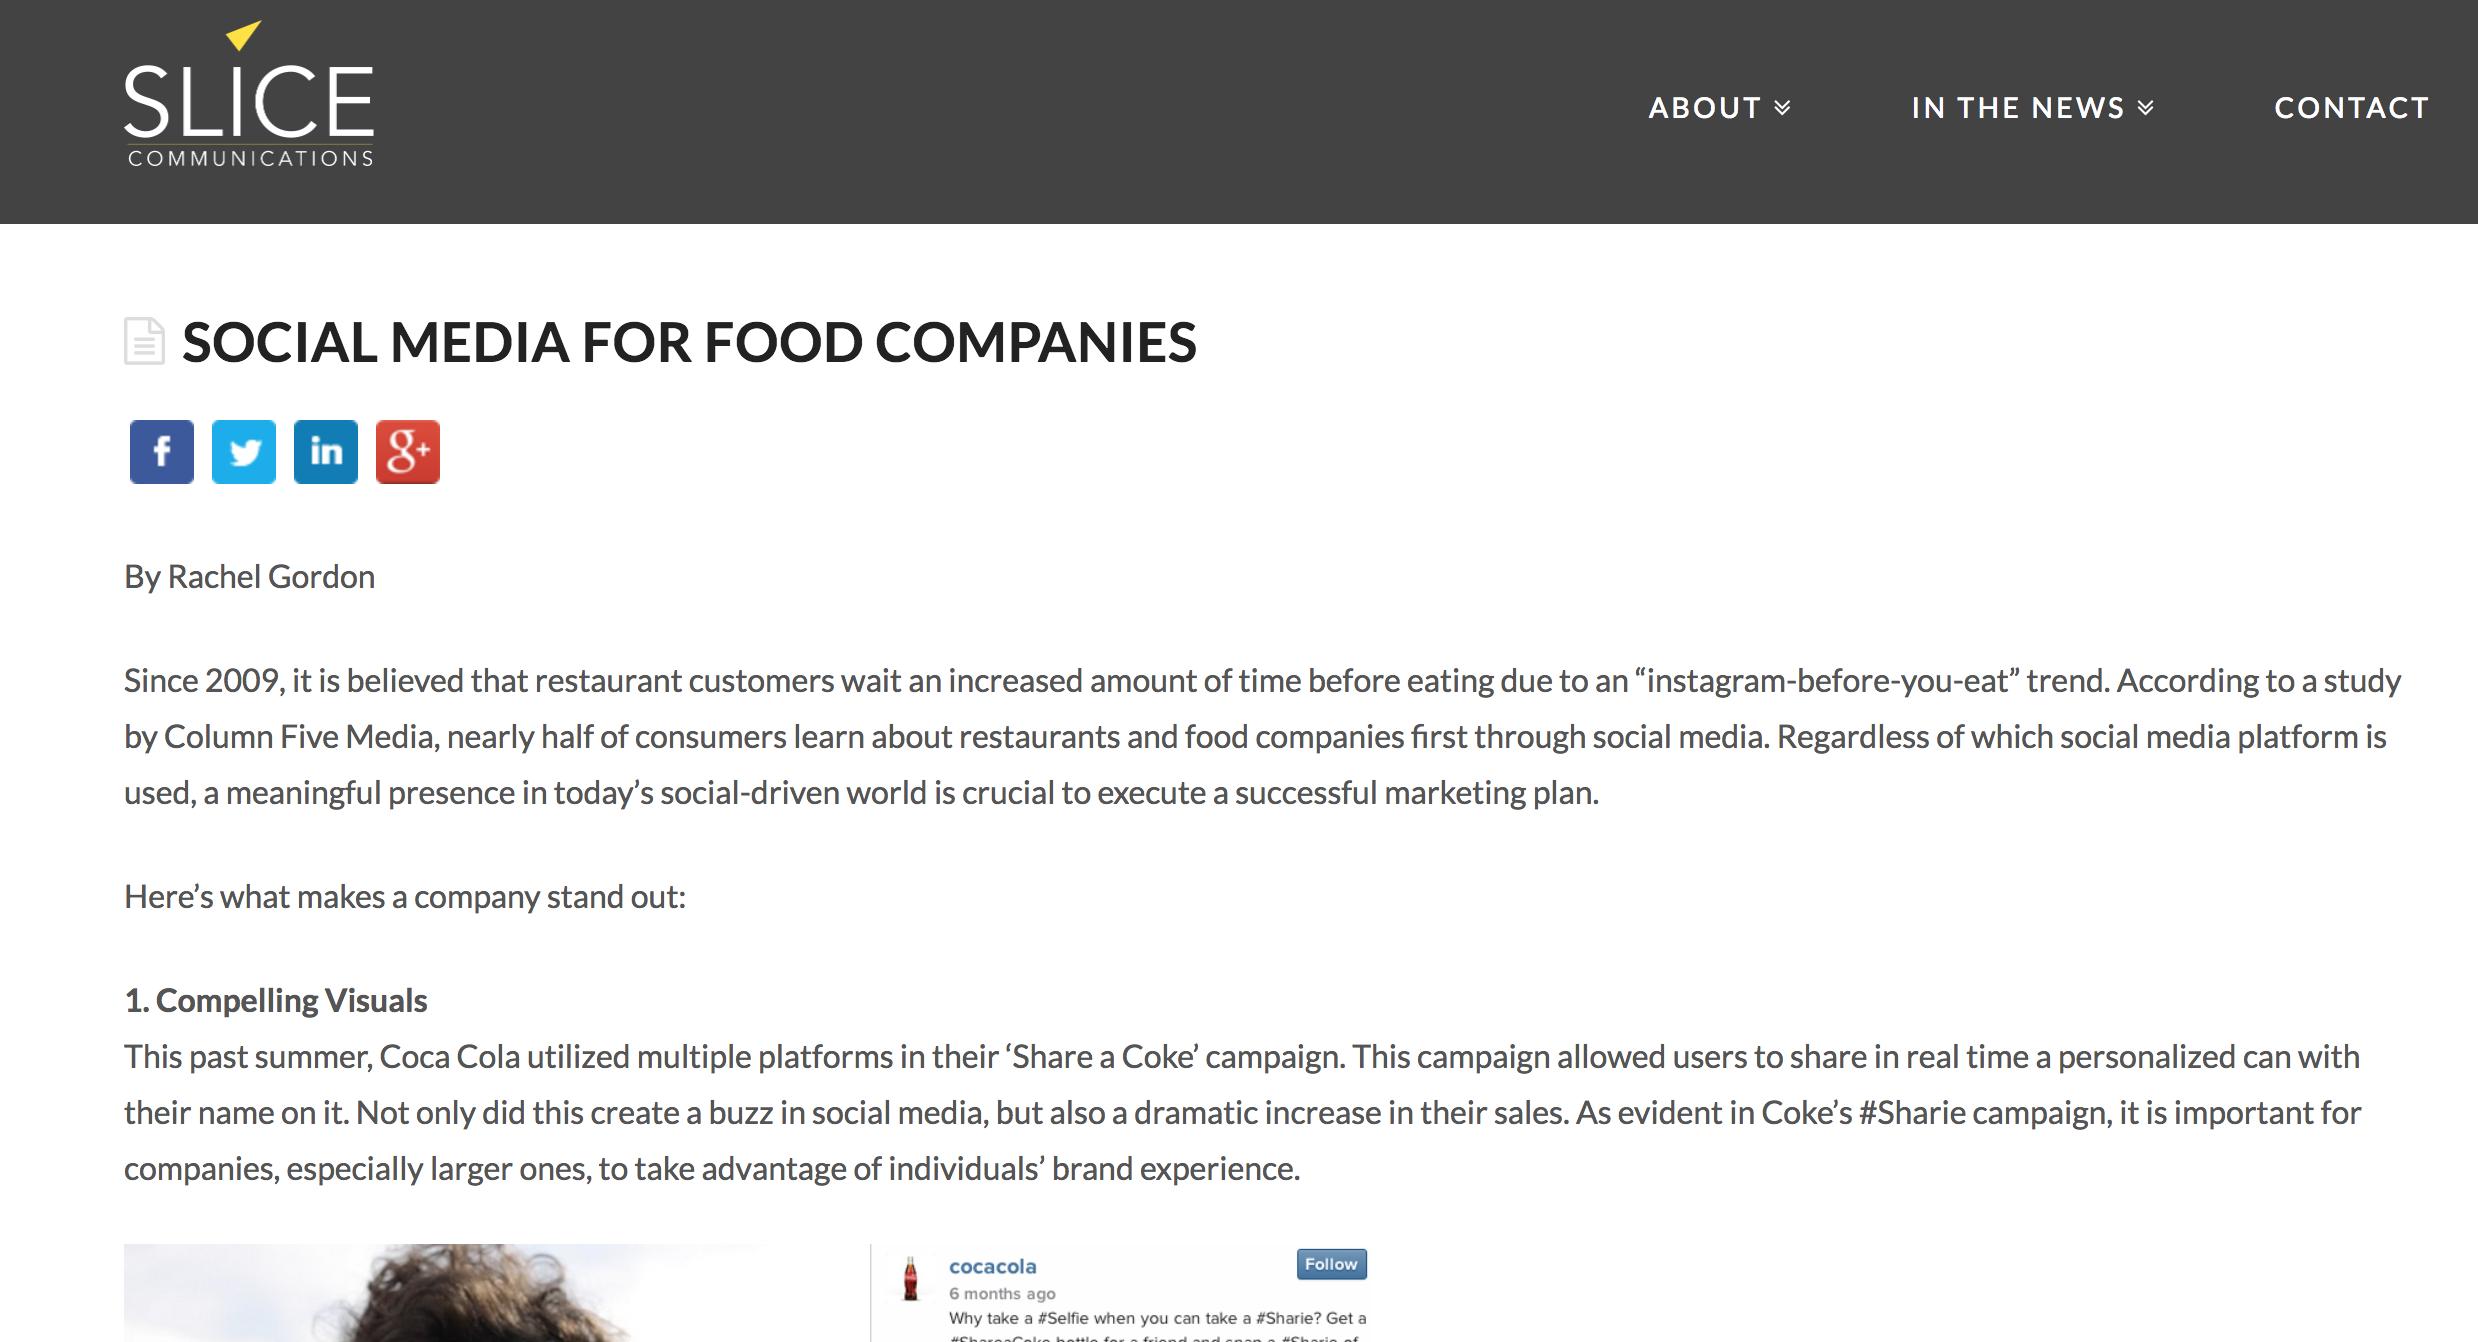 Blog: Social Media for Food Companies